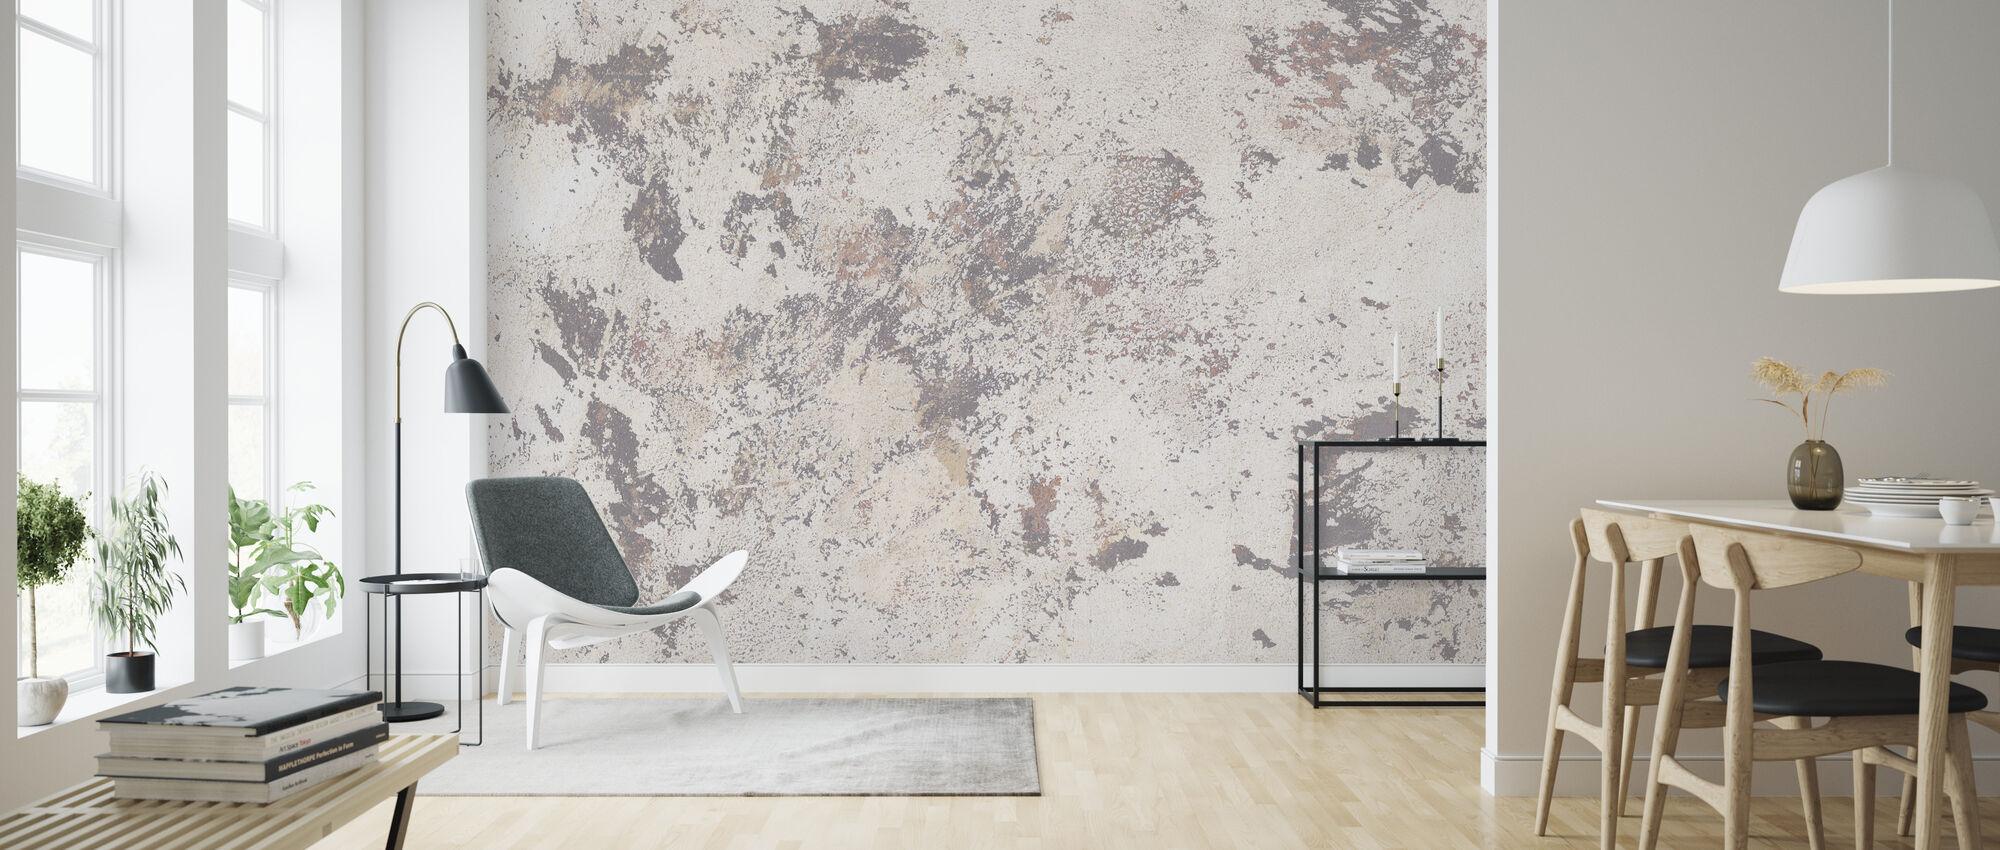 Light Spotted Wall - Wallpaper - Living Room